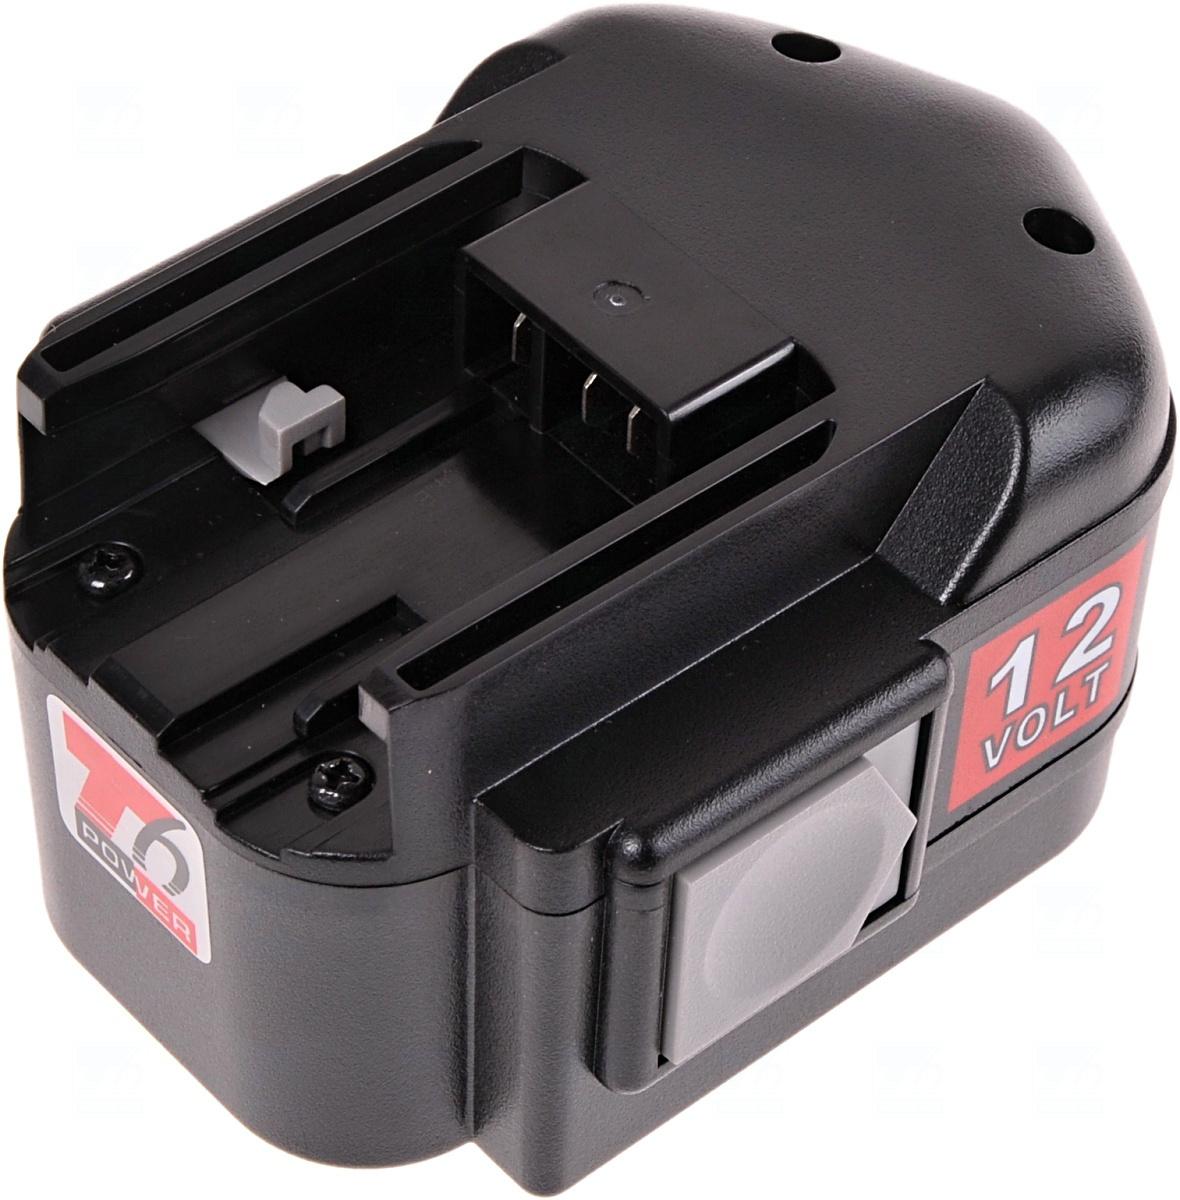 Baterie T6 power MXM12, M1230, 48-11-1900, 48-11-1950, 48-11-1960, 48-11-1967, 48-11-1970, 4932353639, 4932373522, 4932376508, B12, B1215, BX12, MX12, Ni-MH, 12V, 2000mAh